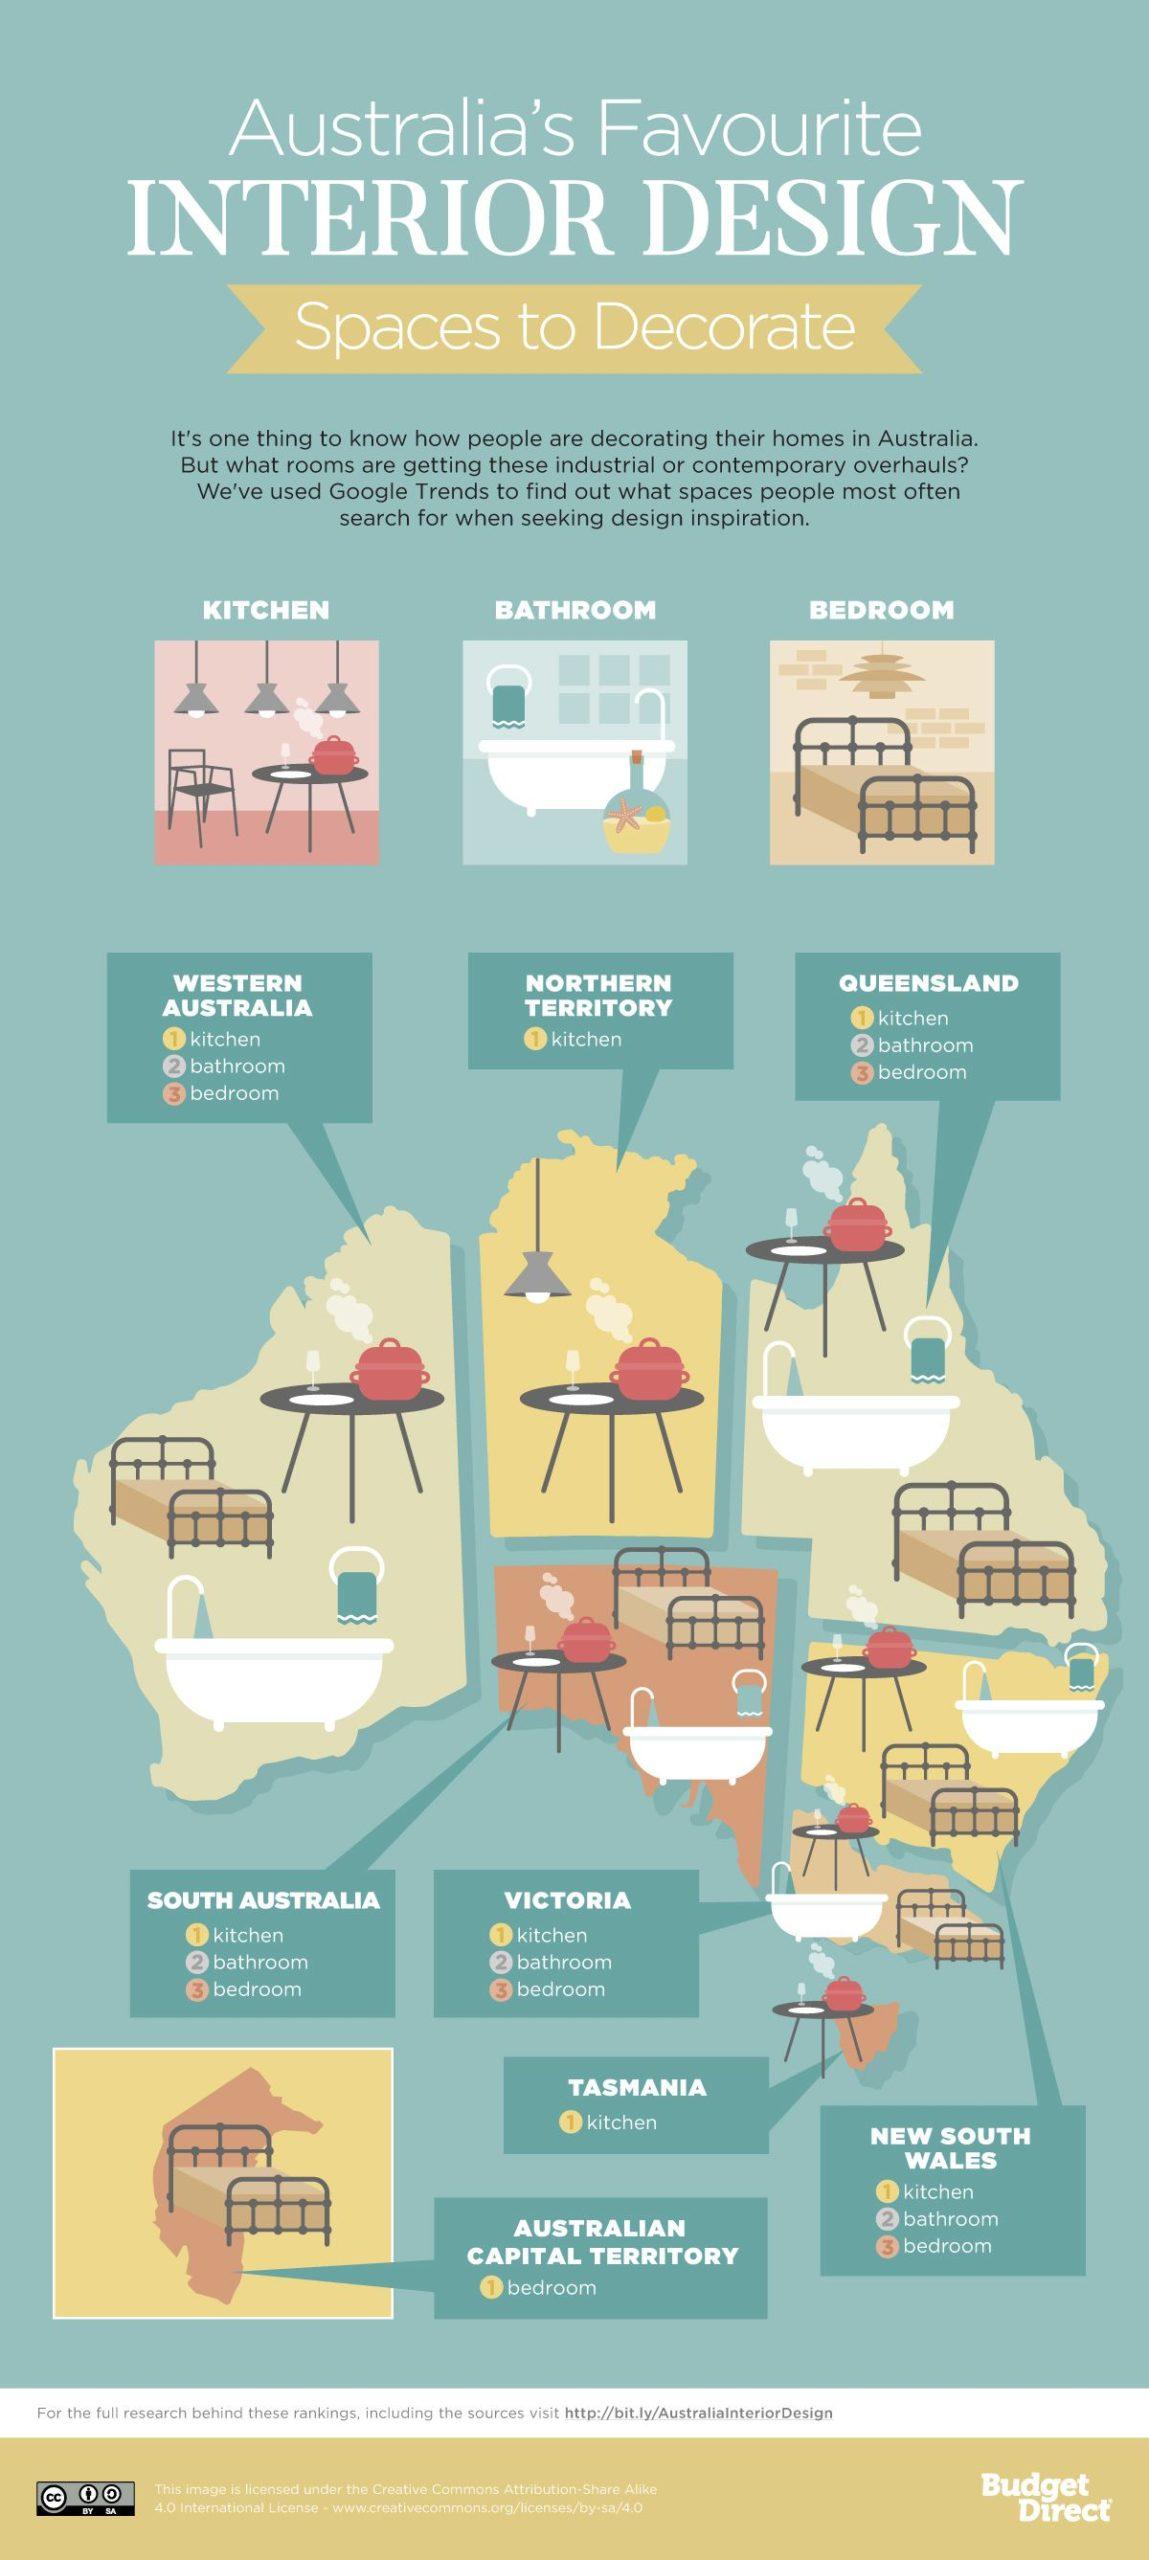 These are Australia's favourite interior design styles